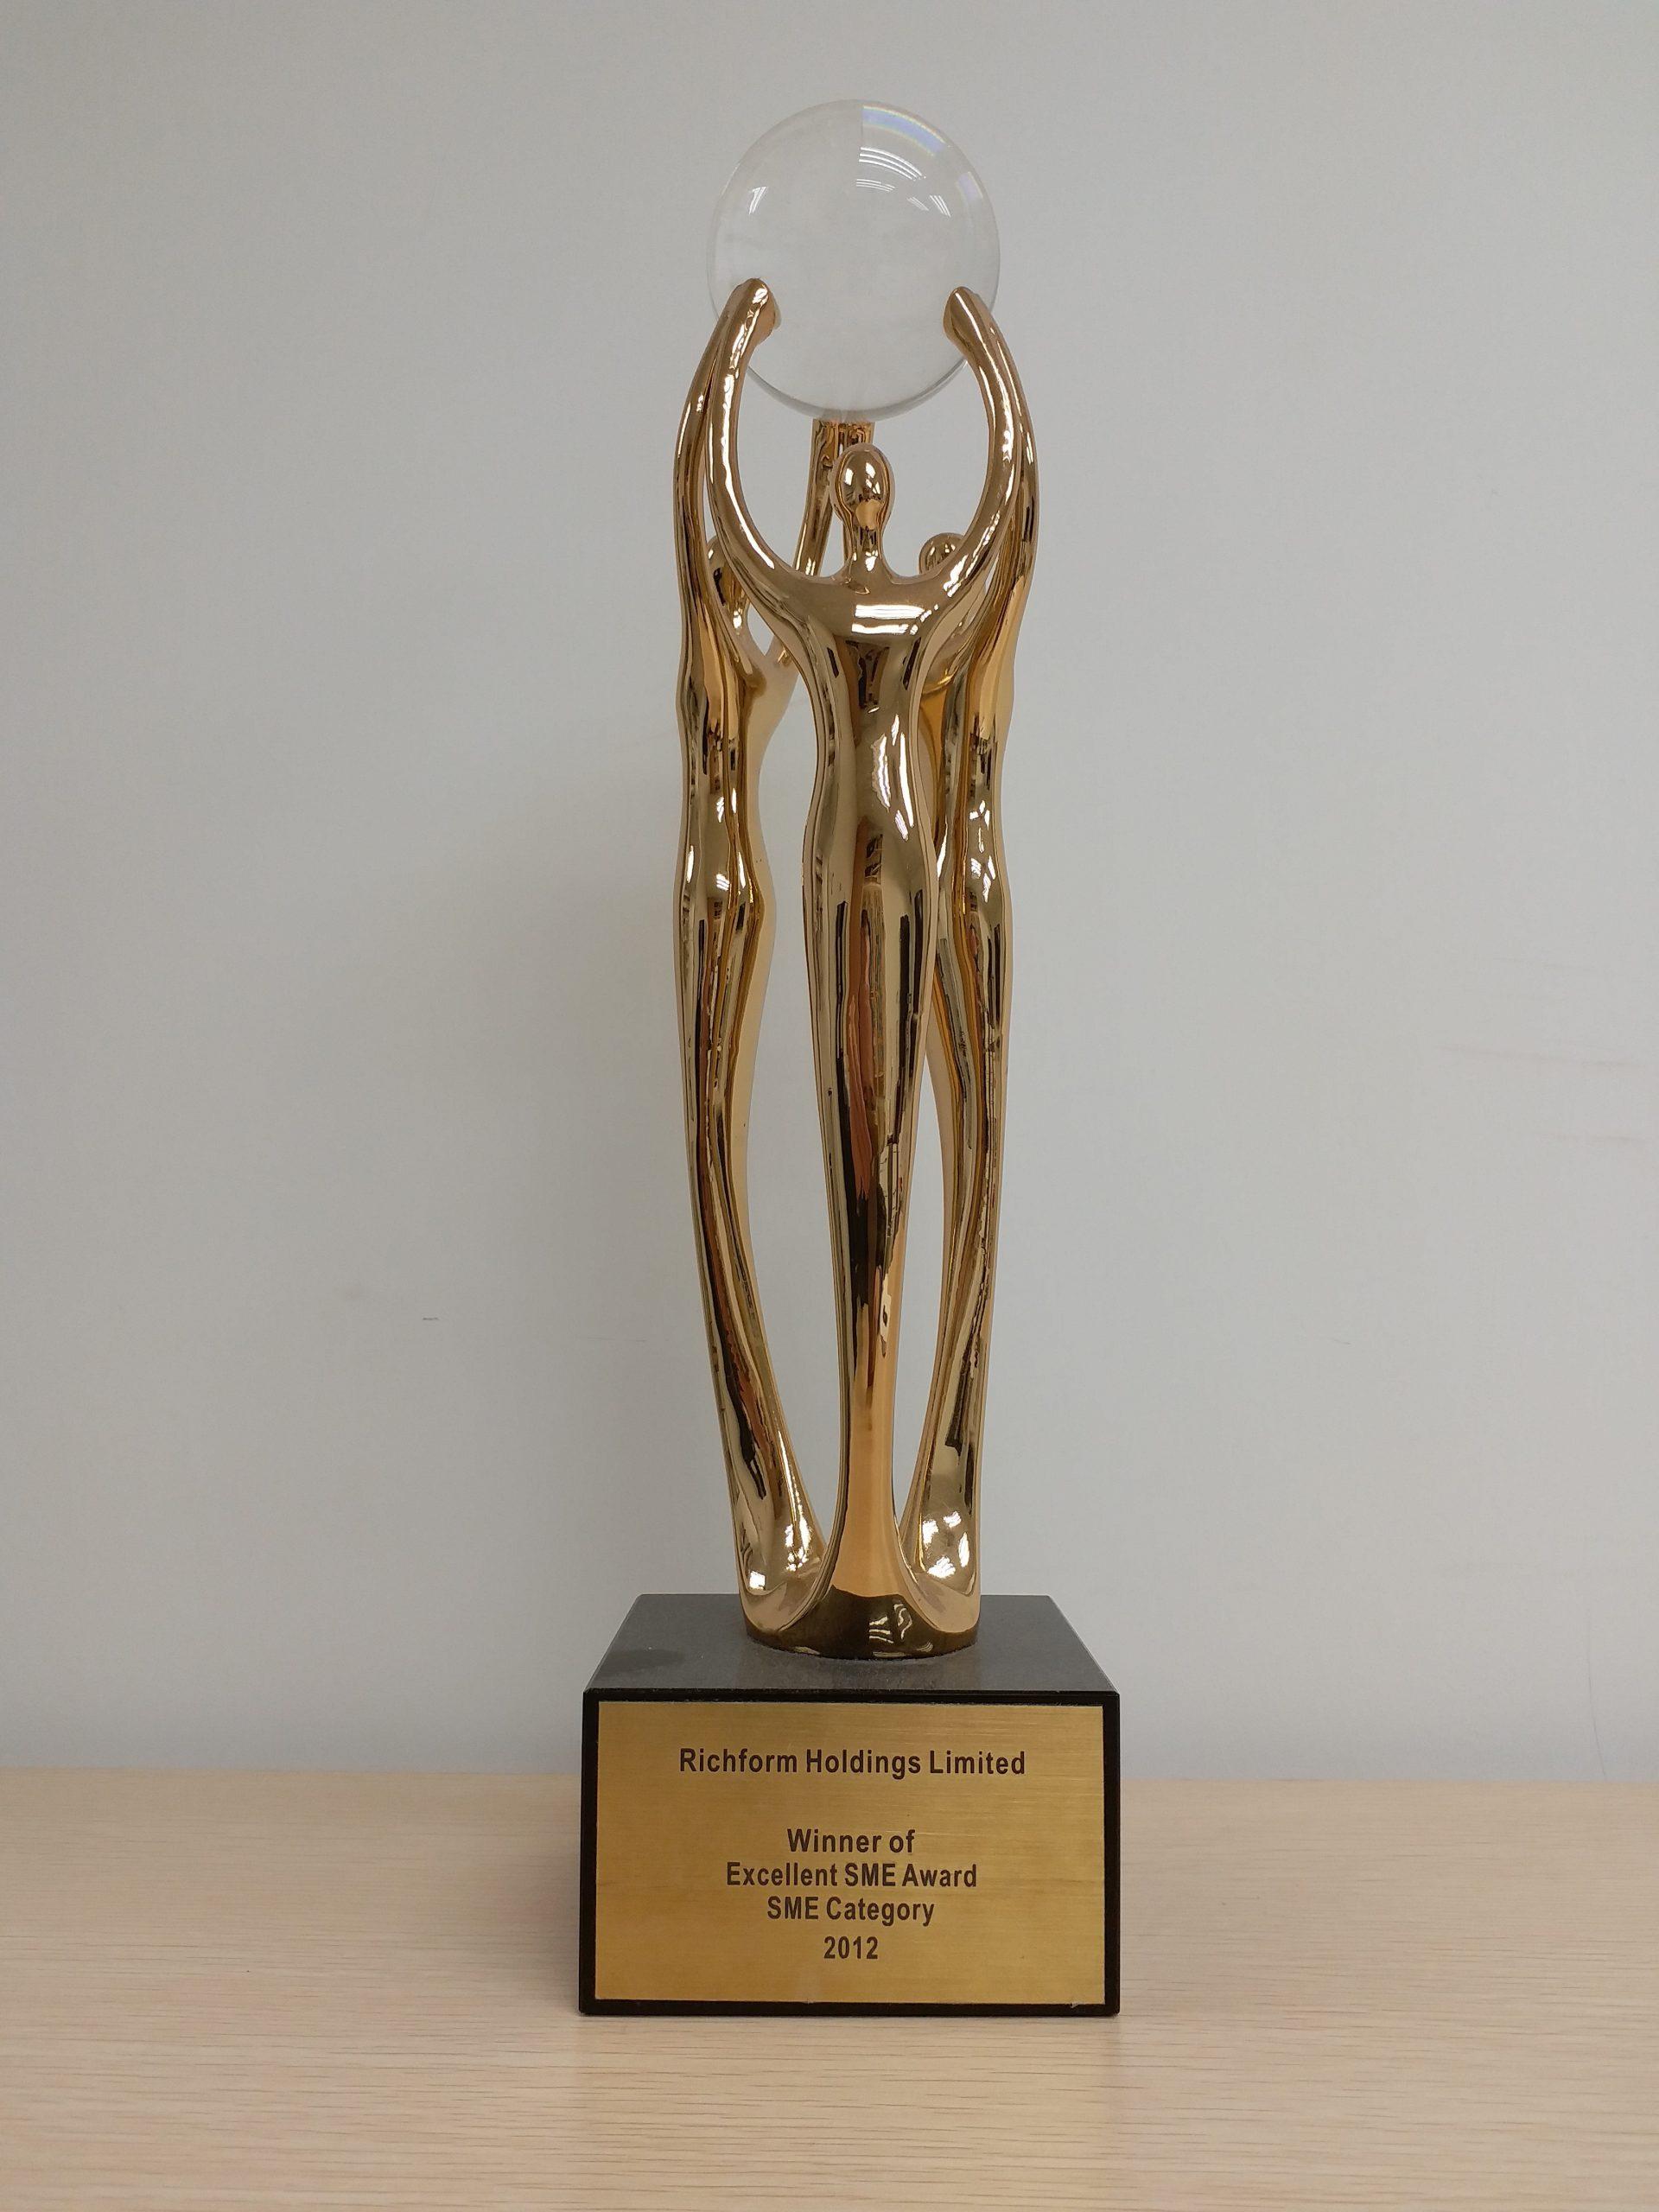 2012 HR Excellence Award Excellence SME Award SME Category